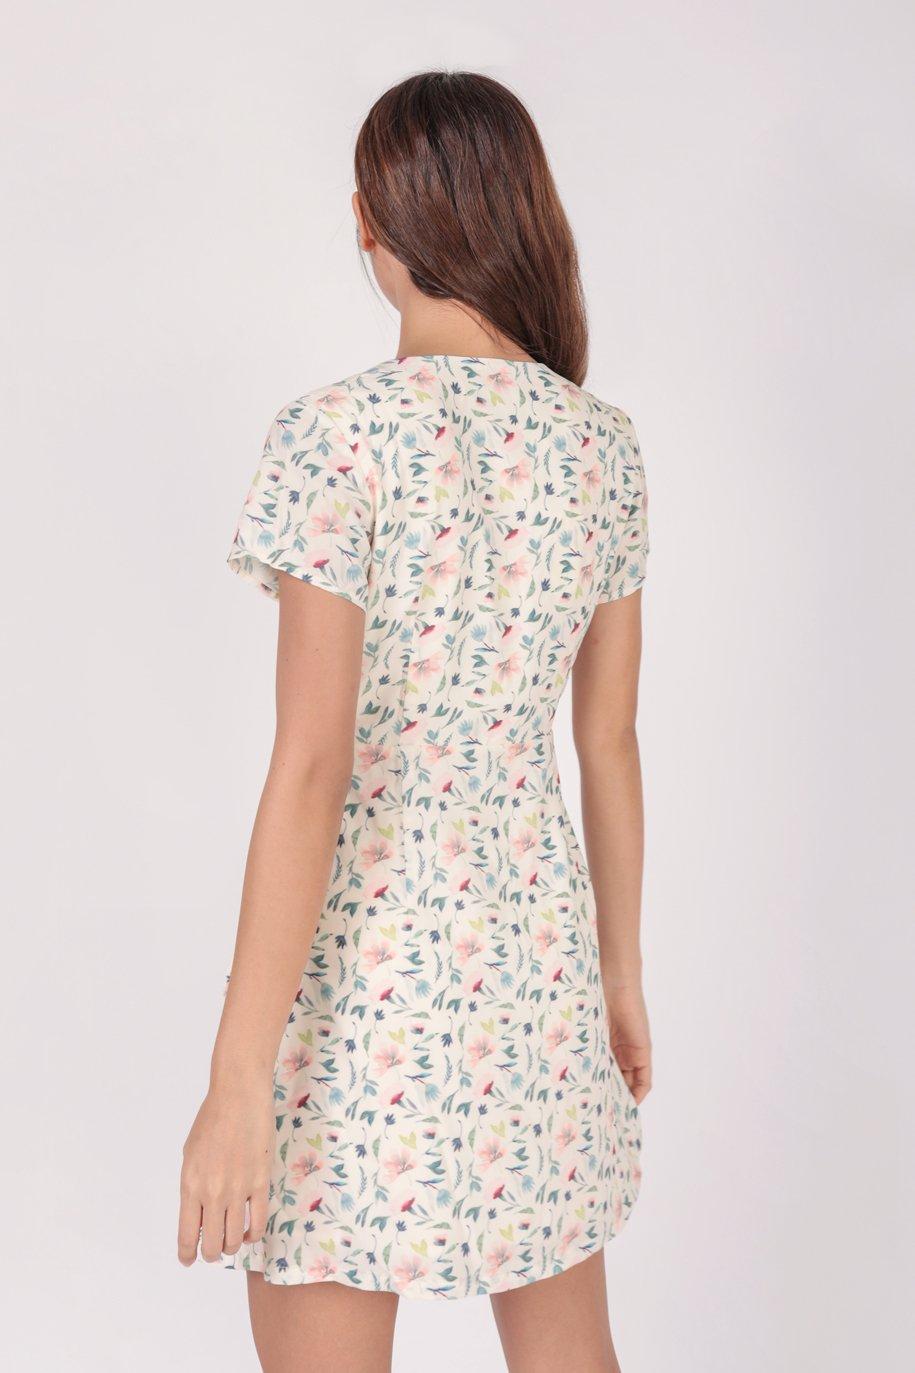 Remy Sleeved Dress (Cream Petals)